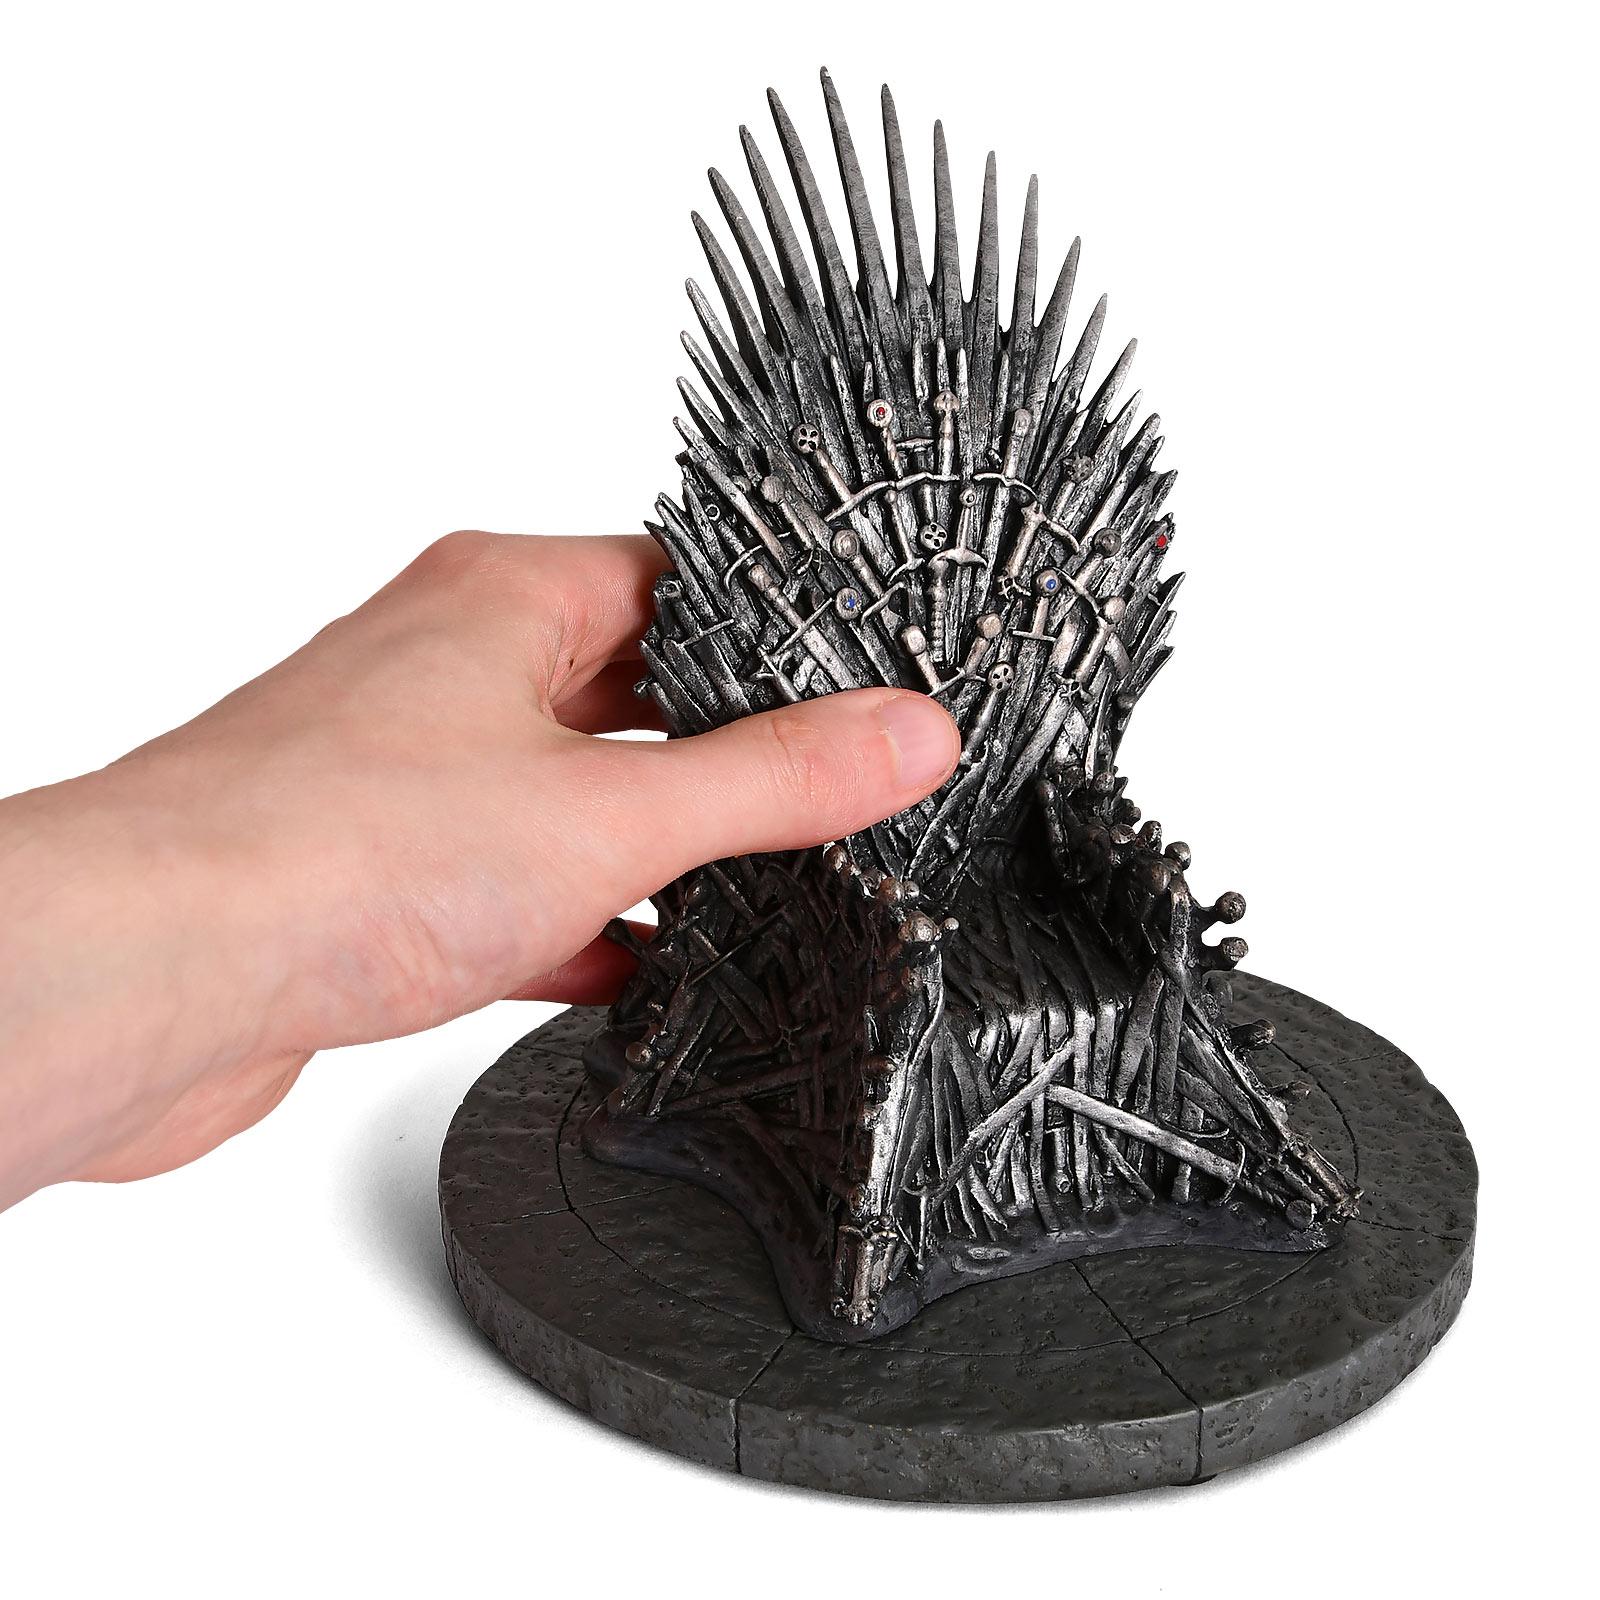 Game of Thrones - Eiserner Thron Replik 17 cm